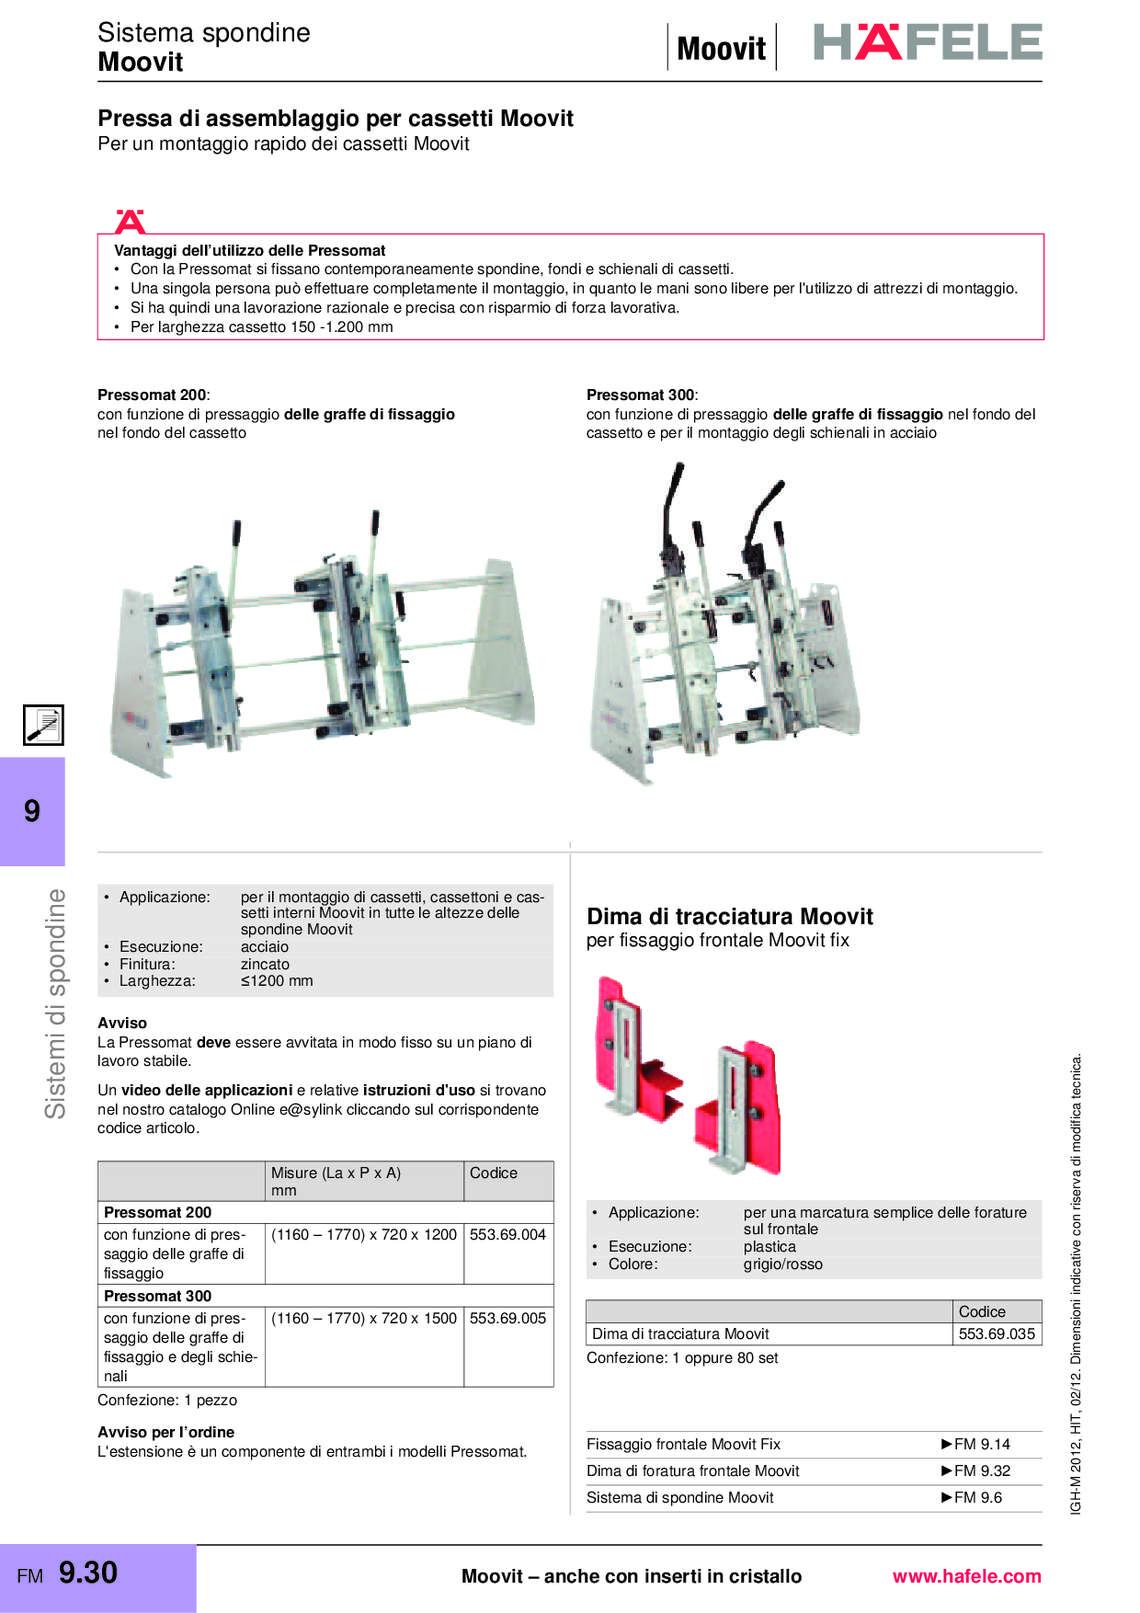 hafele-spondine-e-guide-per-mobili_40_043.jpg